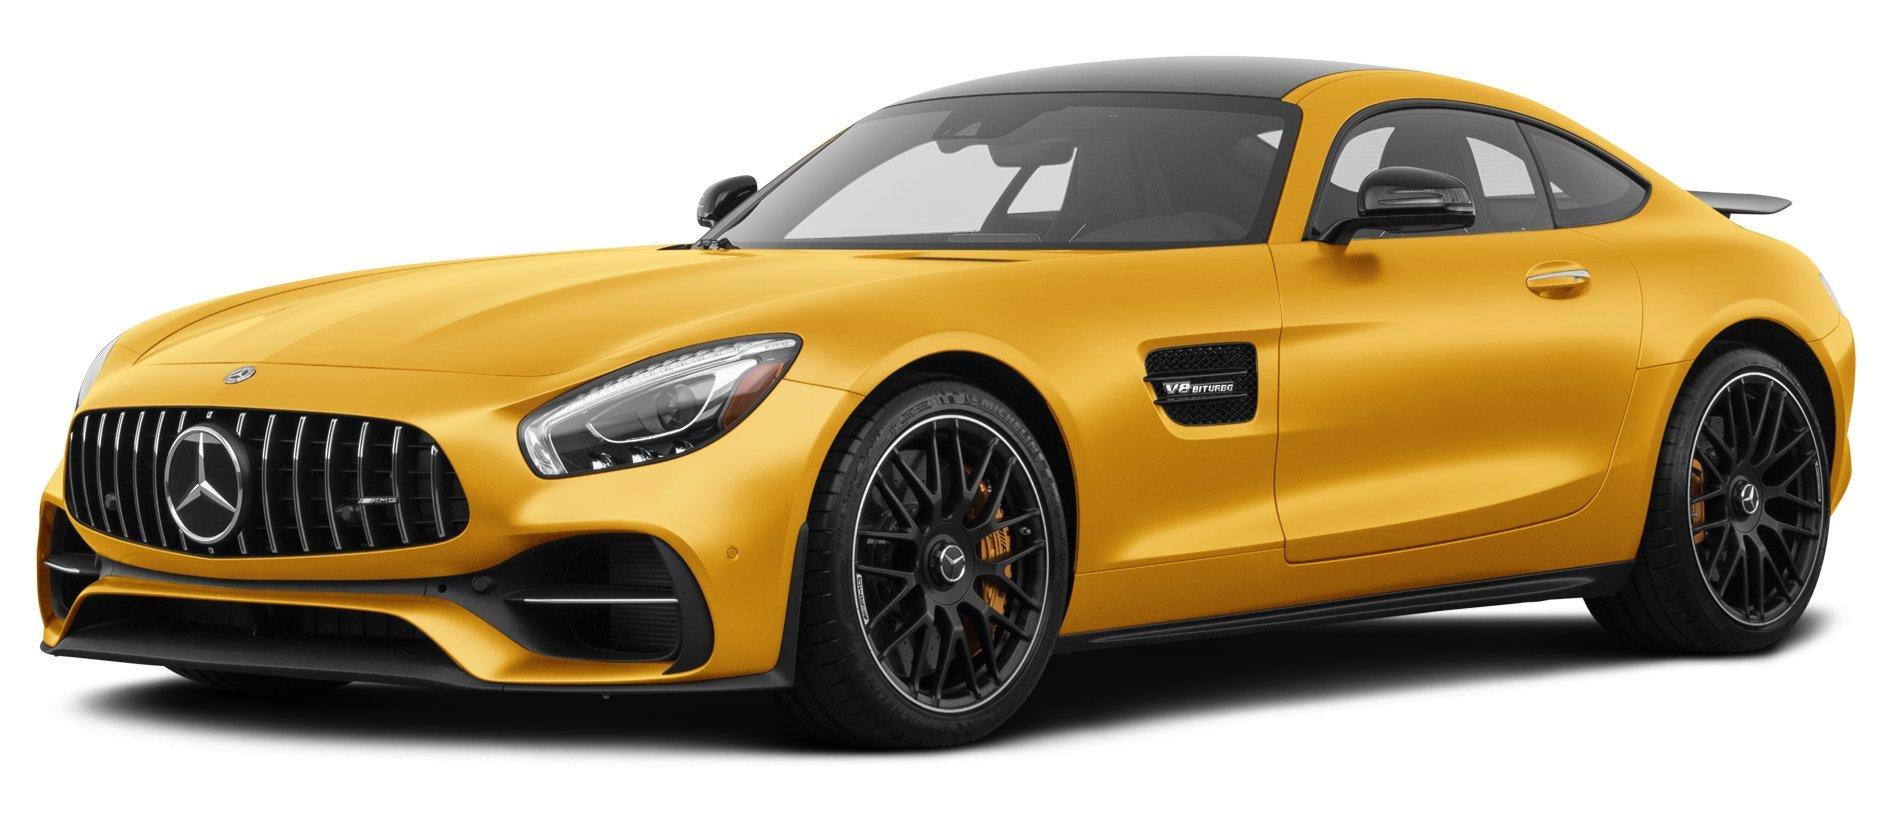 Amazon.com: 2018 Mercedes-Benz AMG GT C Reviews, Images ...